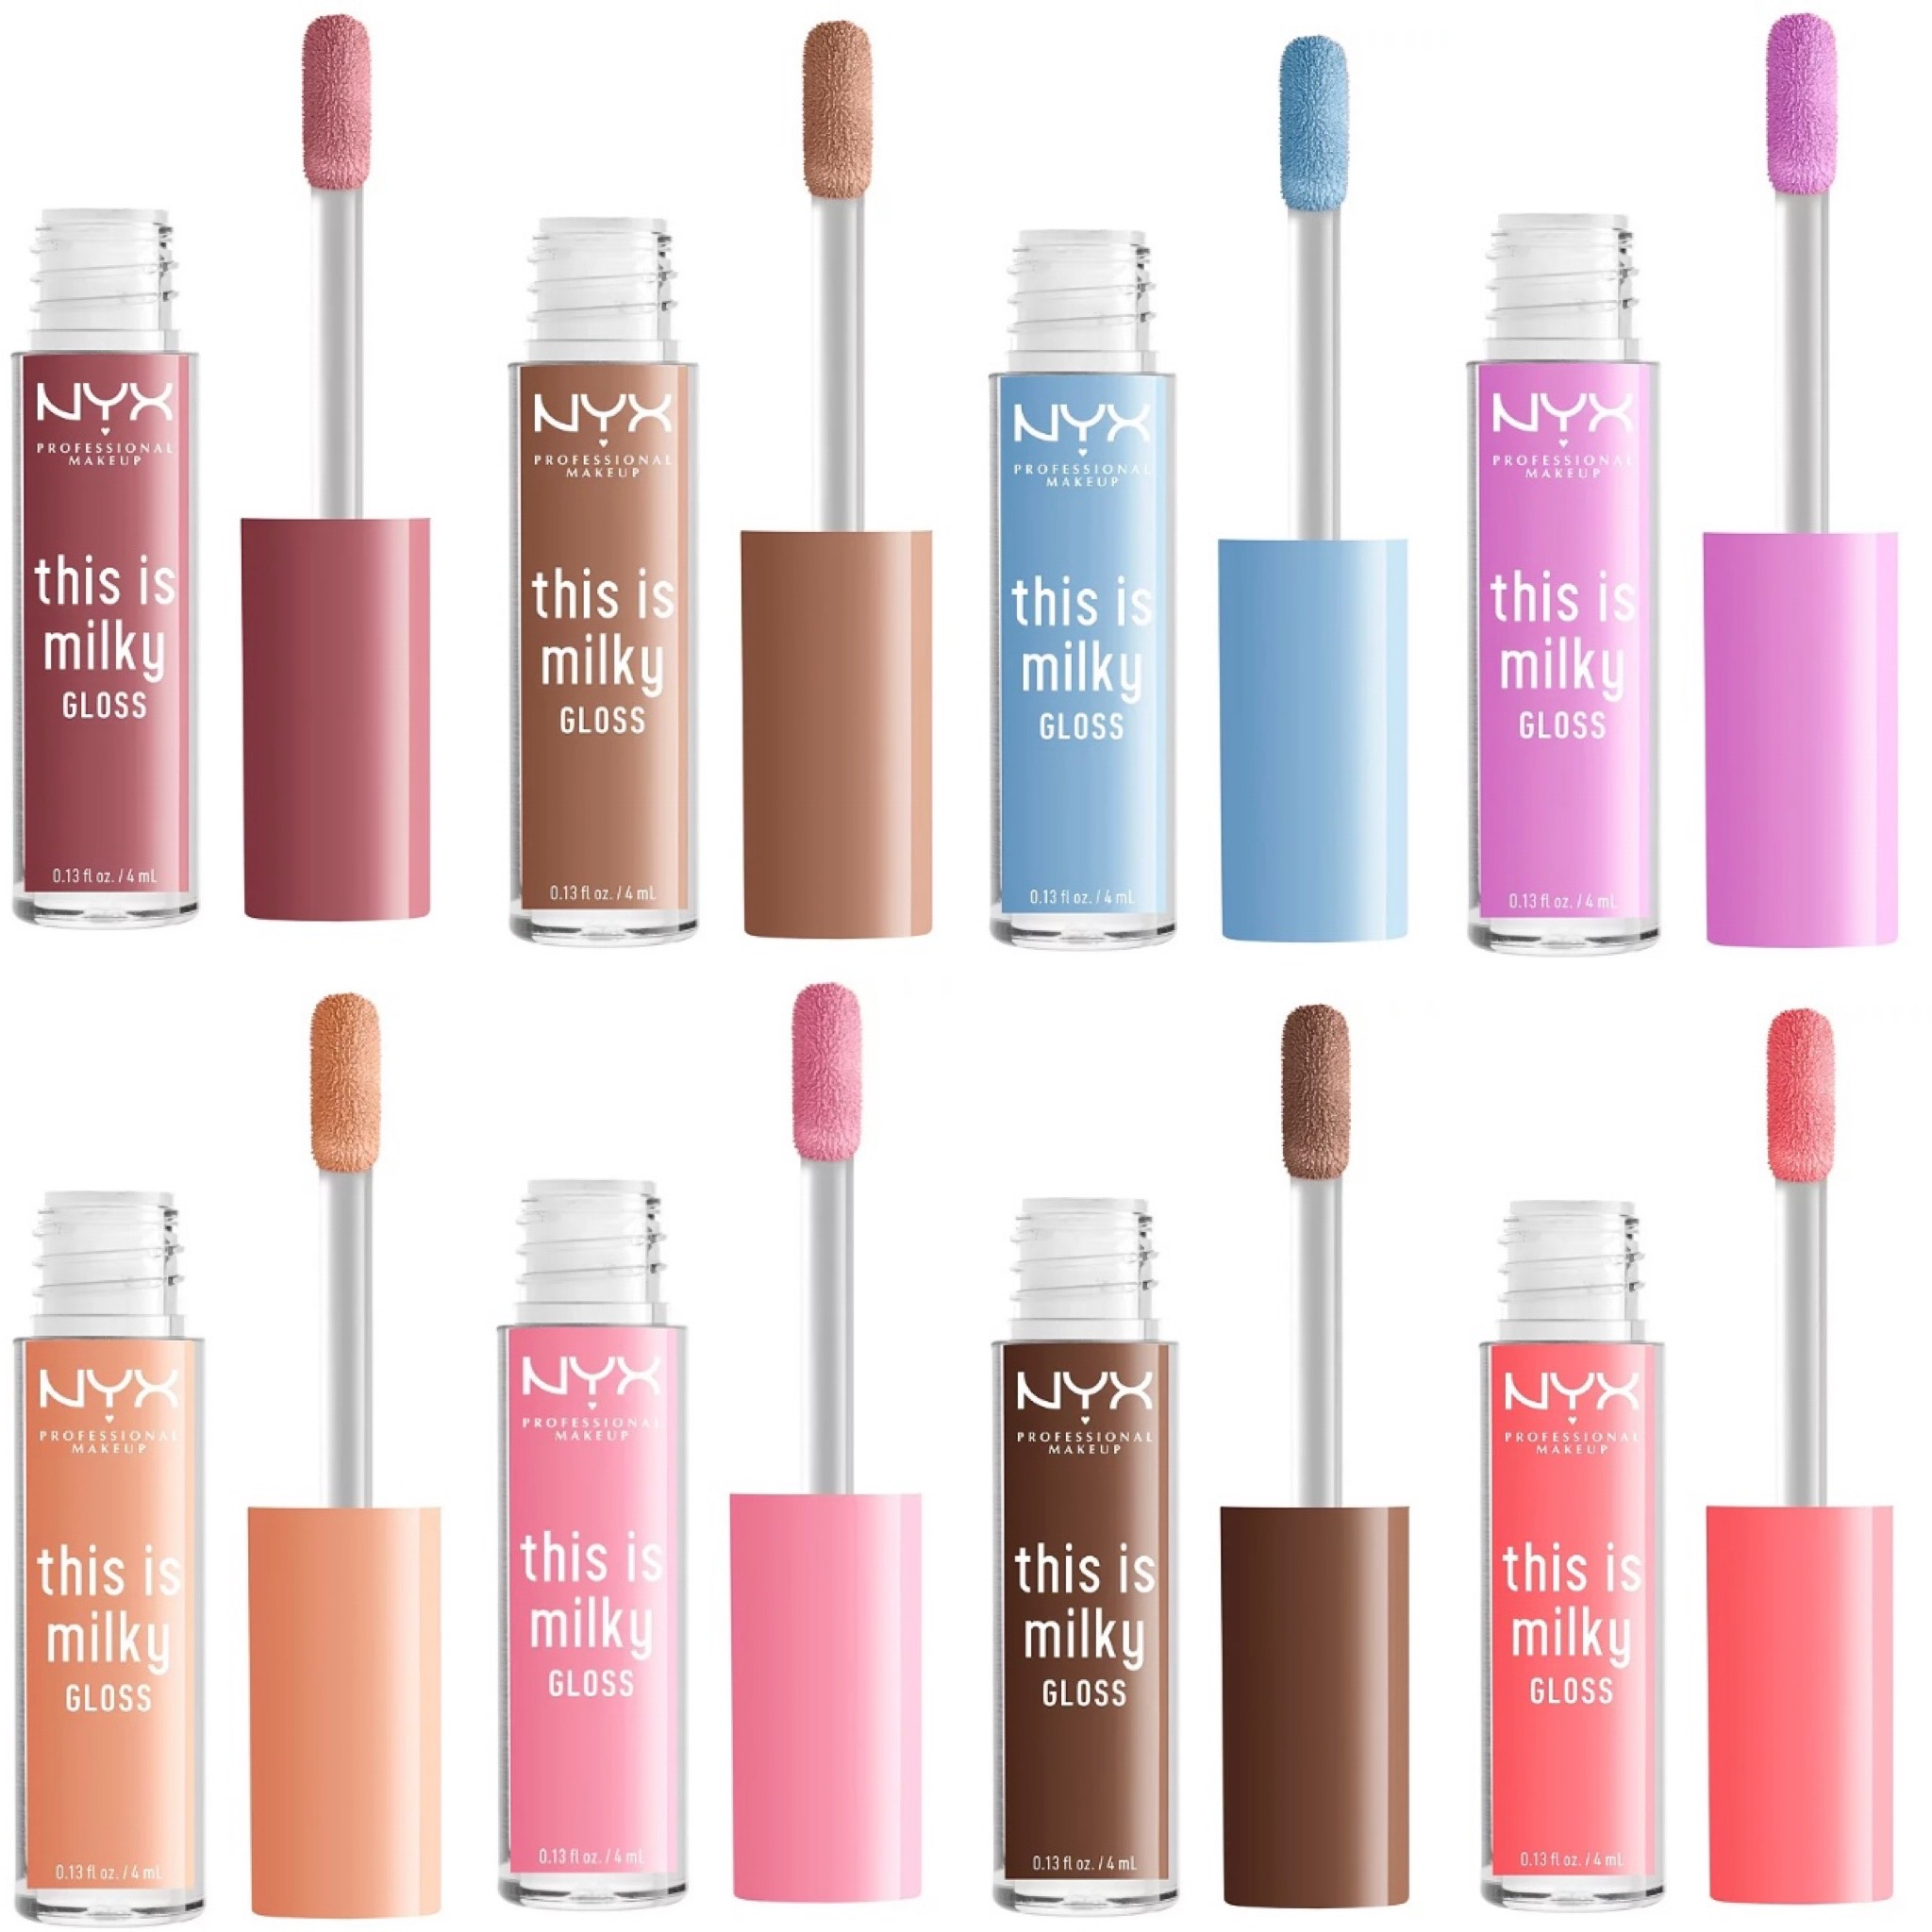 NYX This Is Milky Gloss Lip Gloss